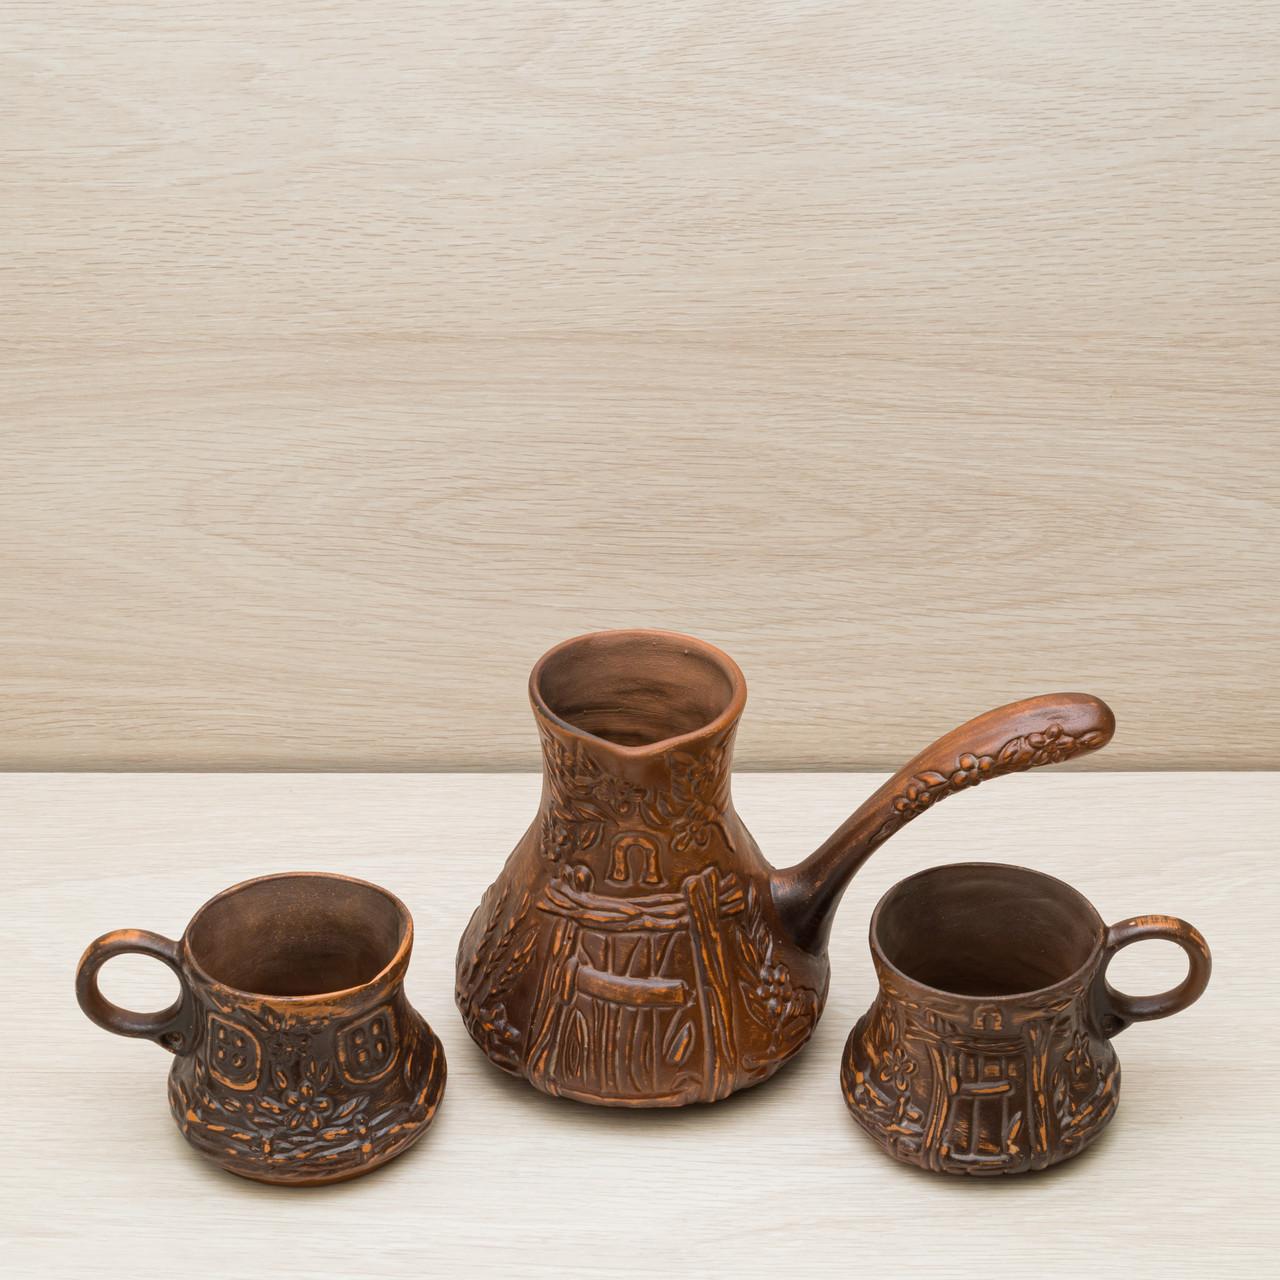 Кофейный набор турка 0,6 л и 2 чашки 0,15 л